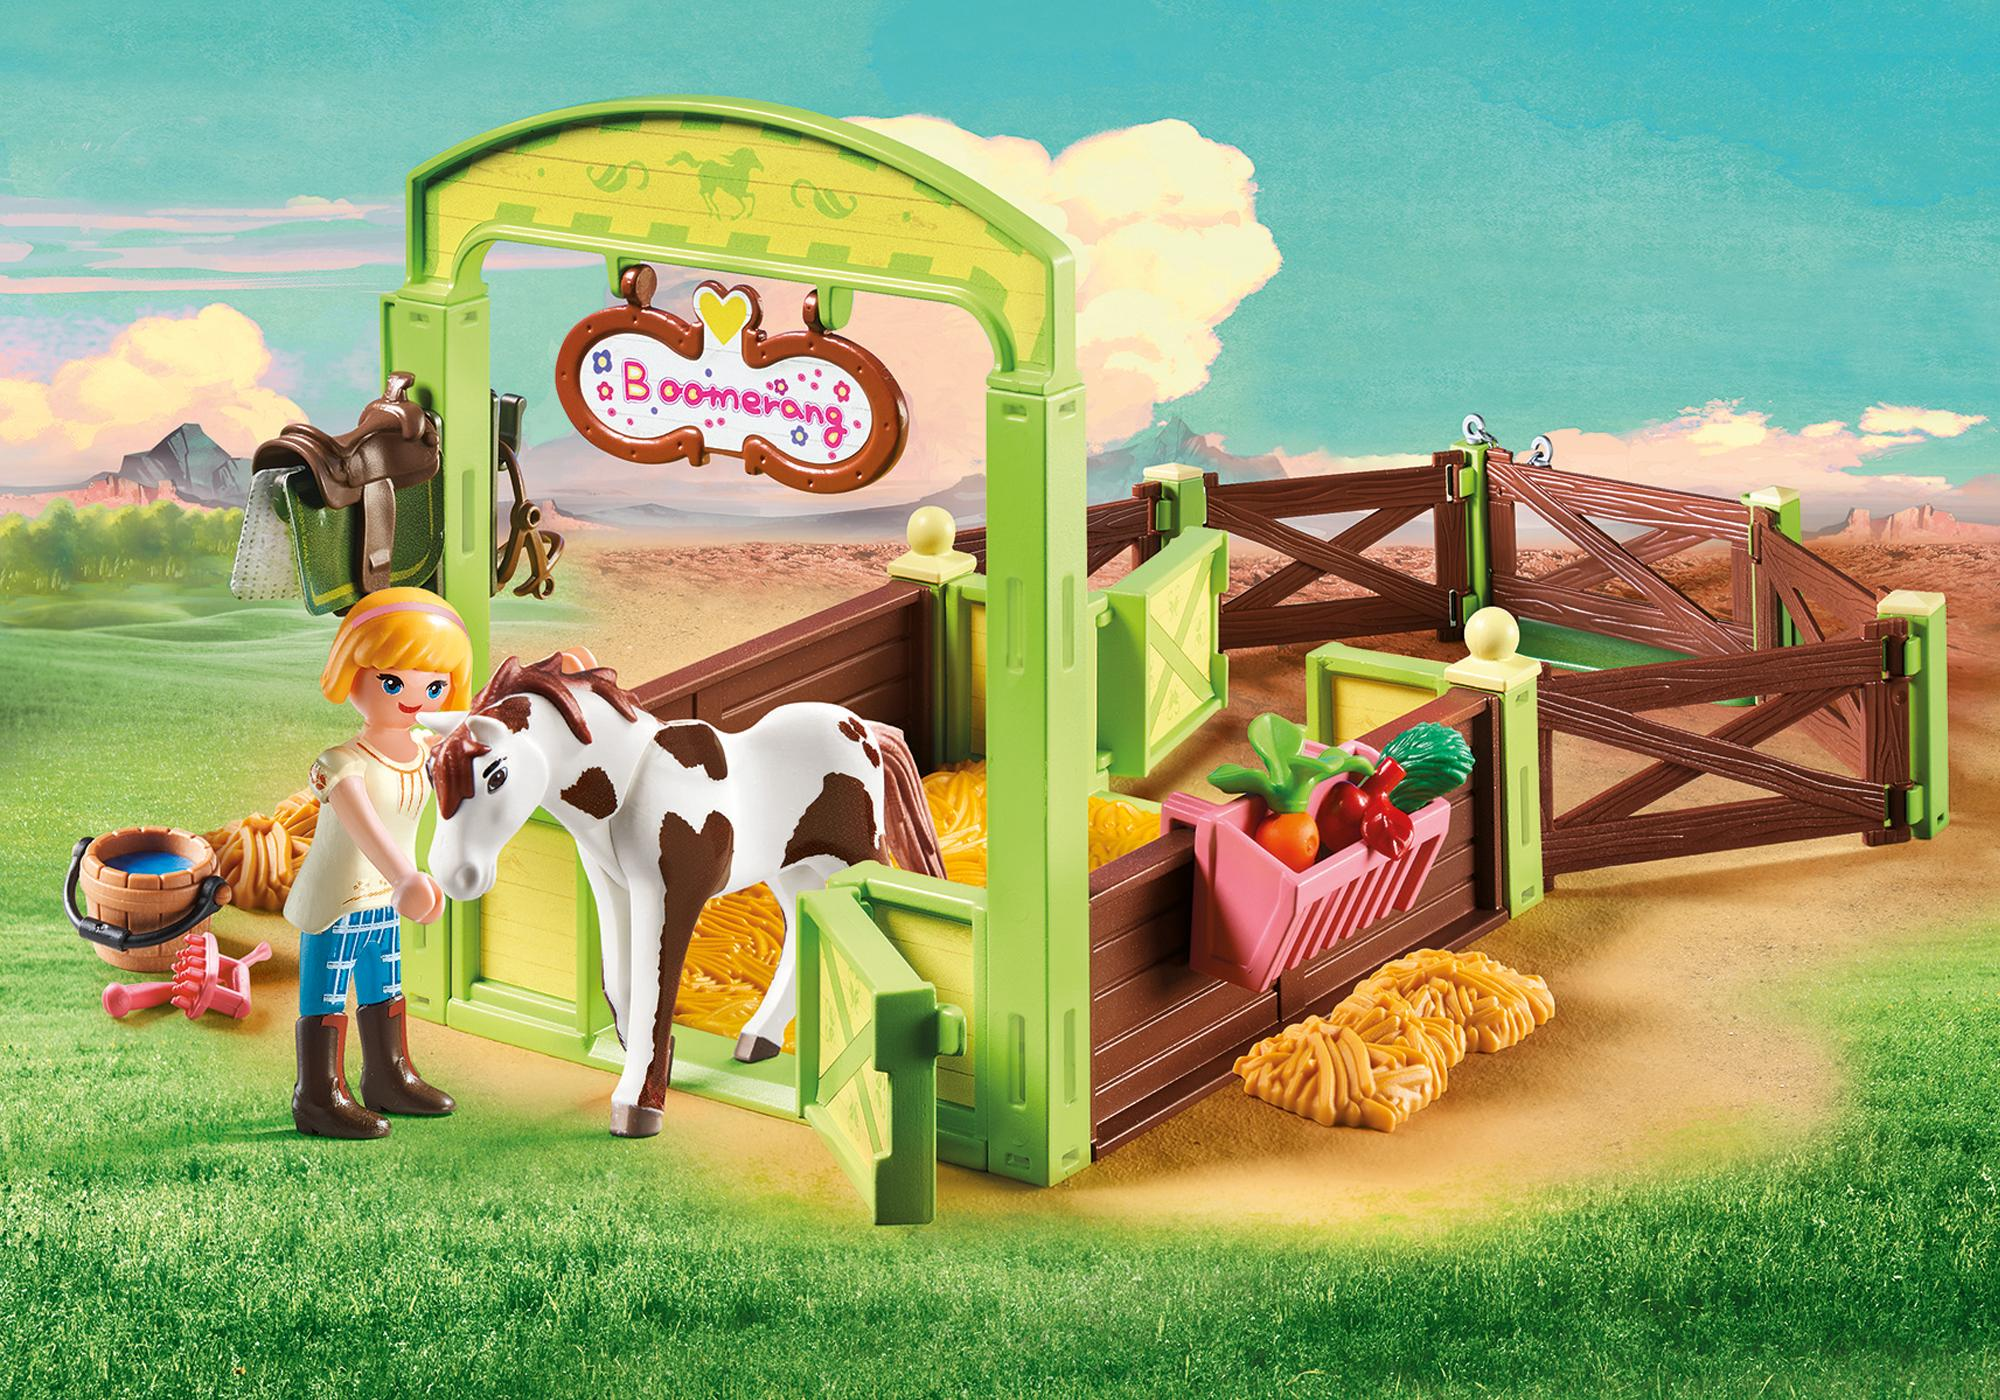 http://media.playmobil.com/i/playmobil/9480_product_detail/Establo Abigail y Boomerang